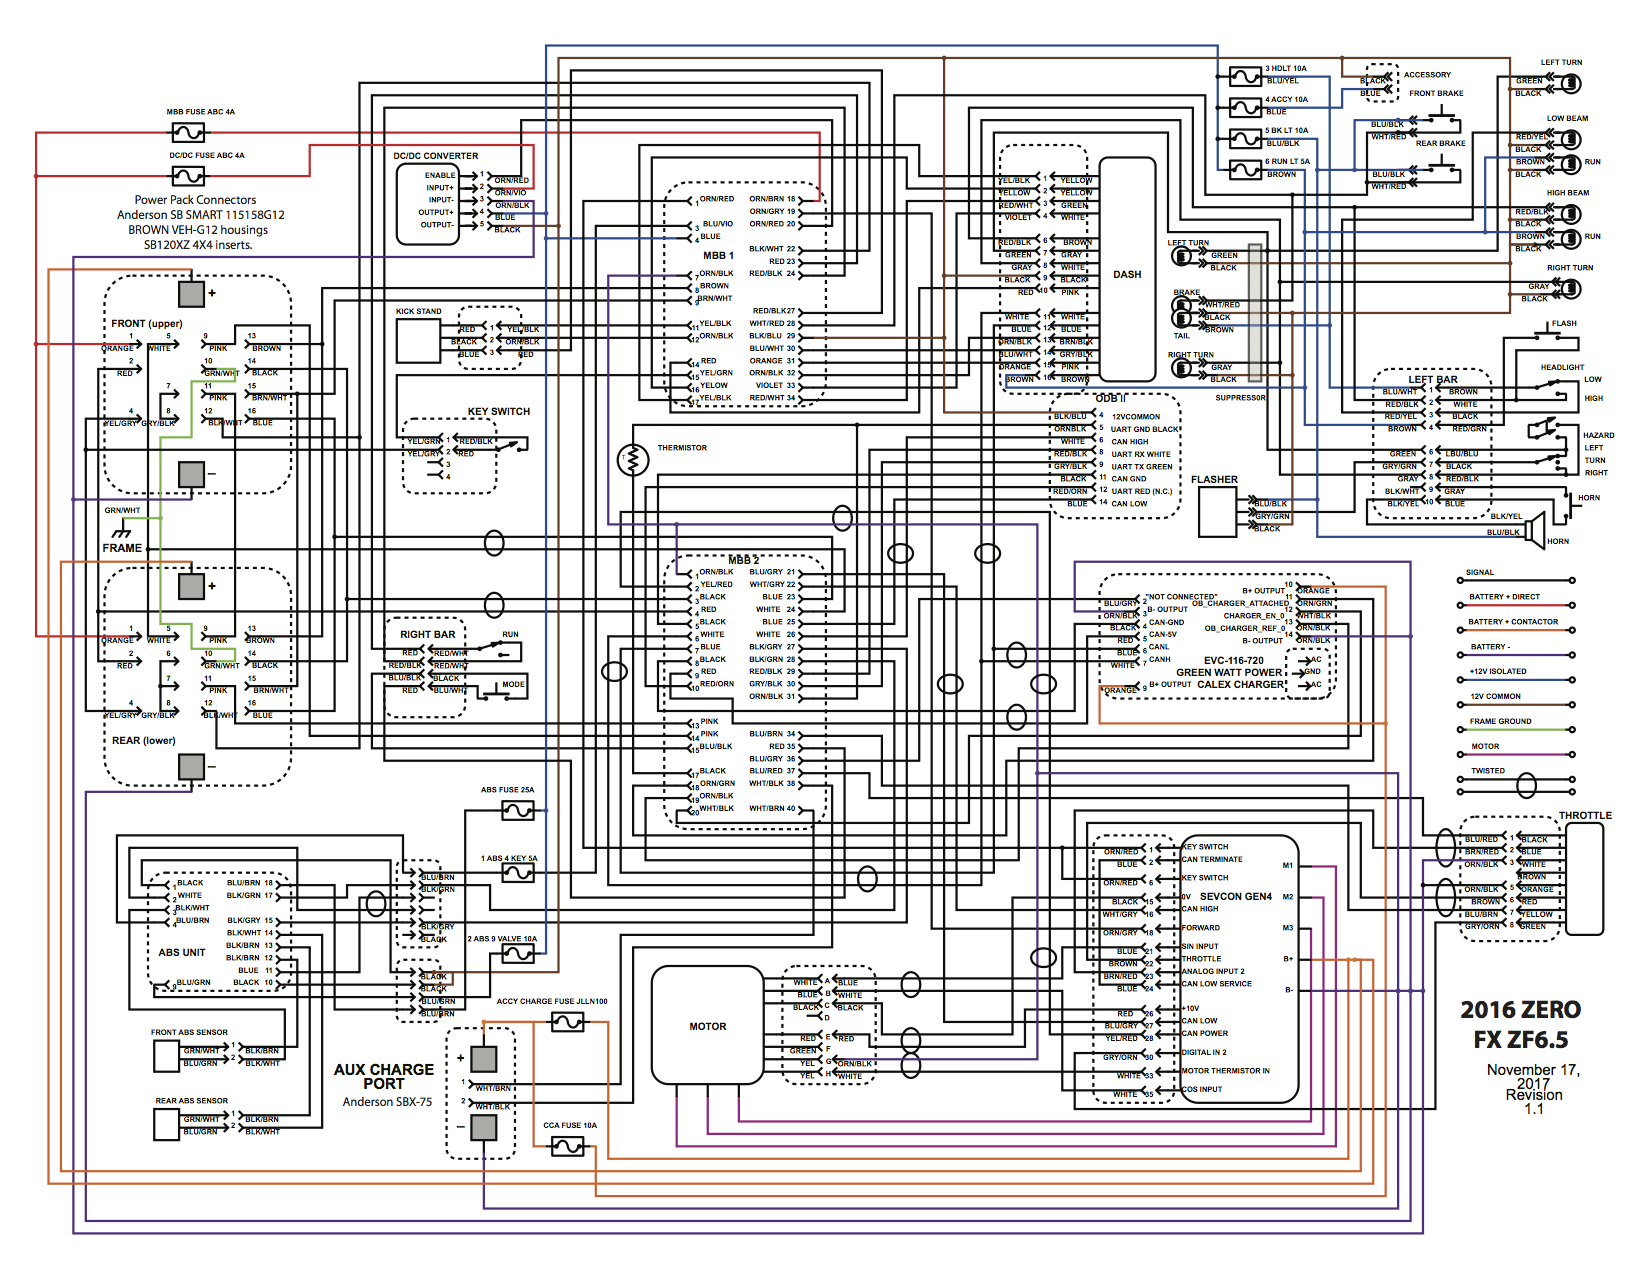 2016 X-platform Wiring Diagram